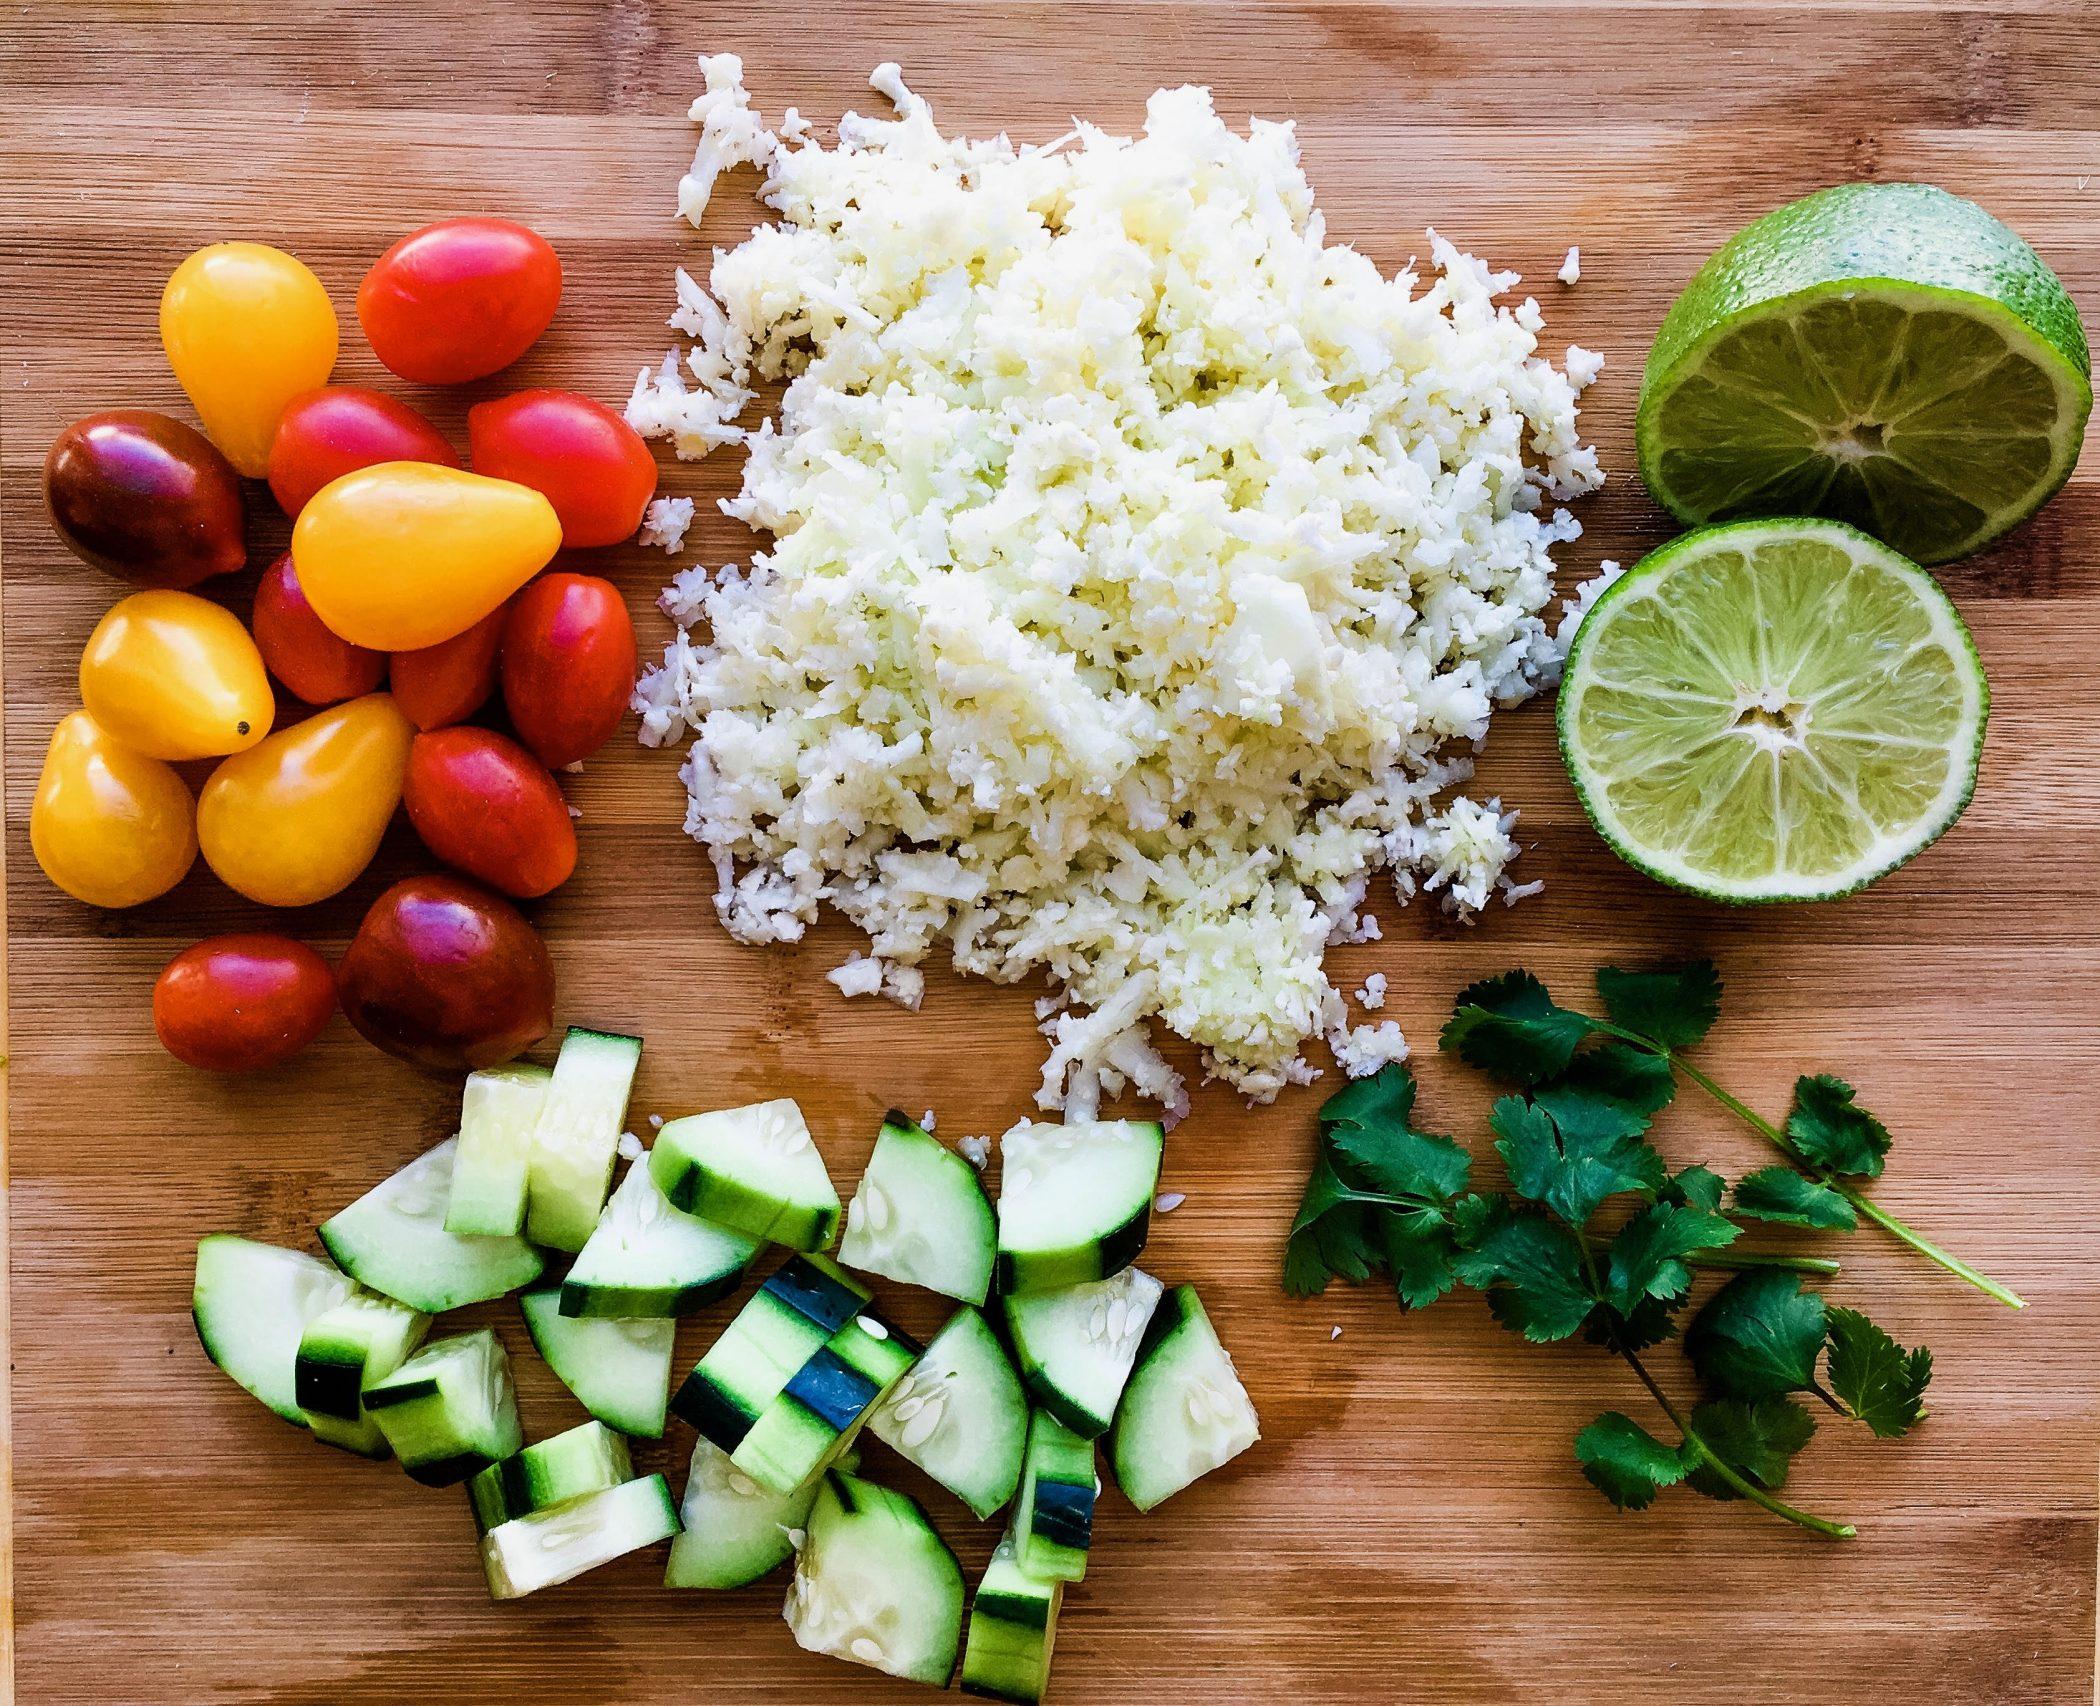 ingredients to make cauliflower salad recipe